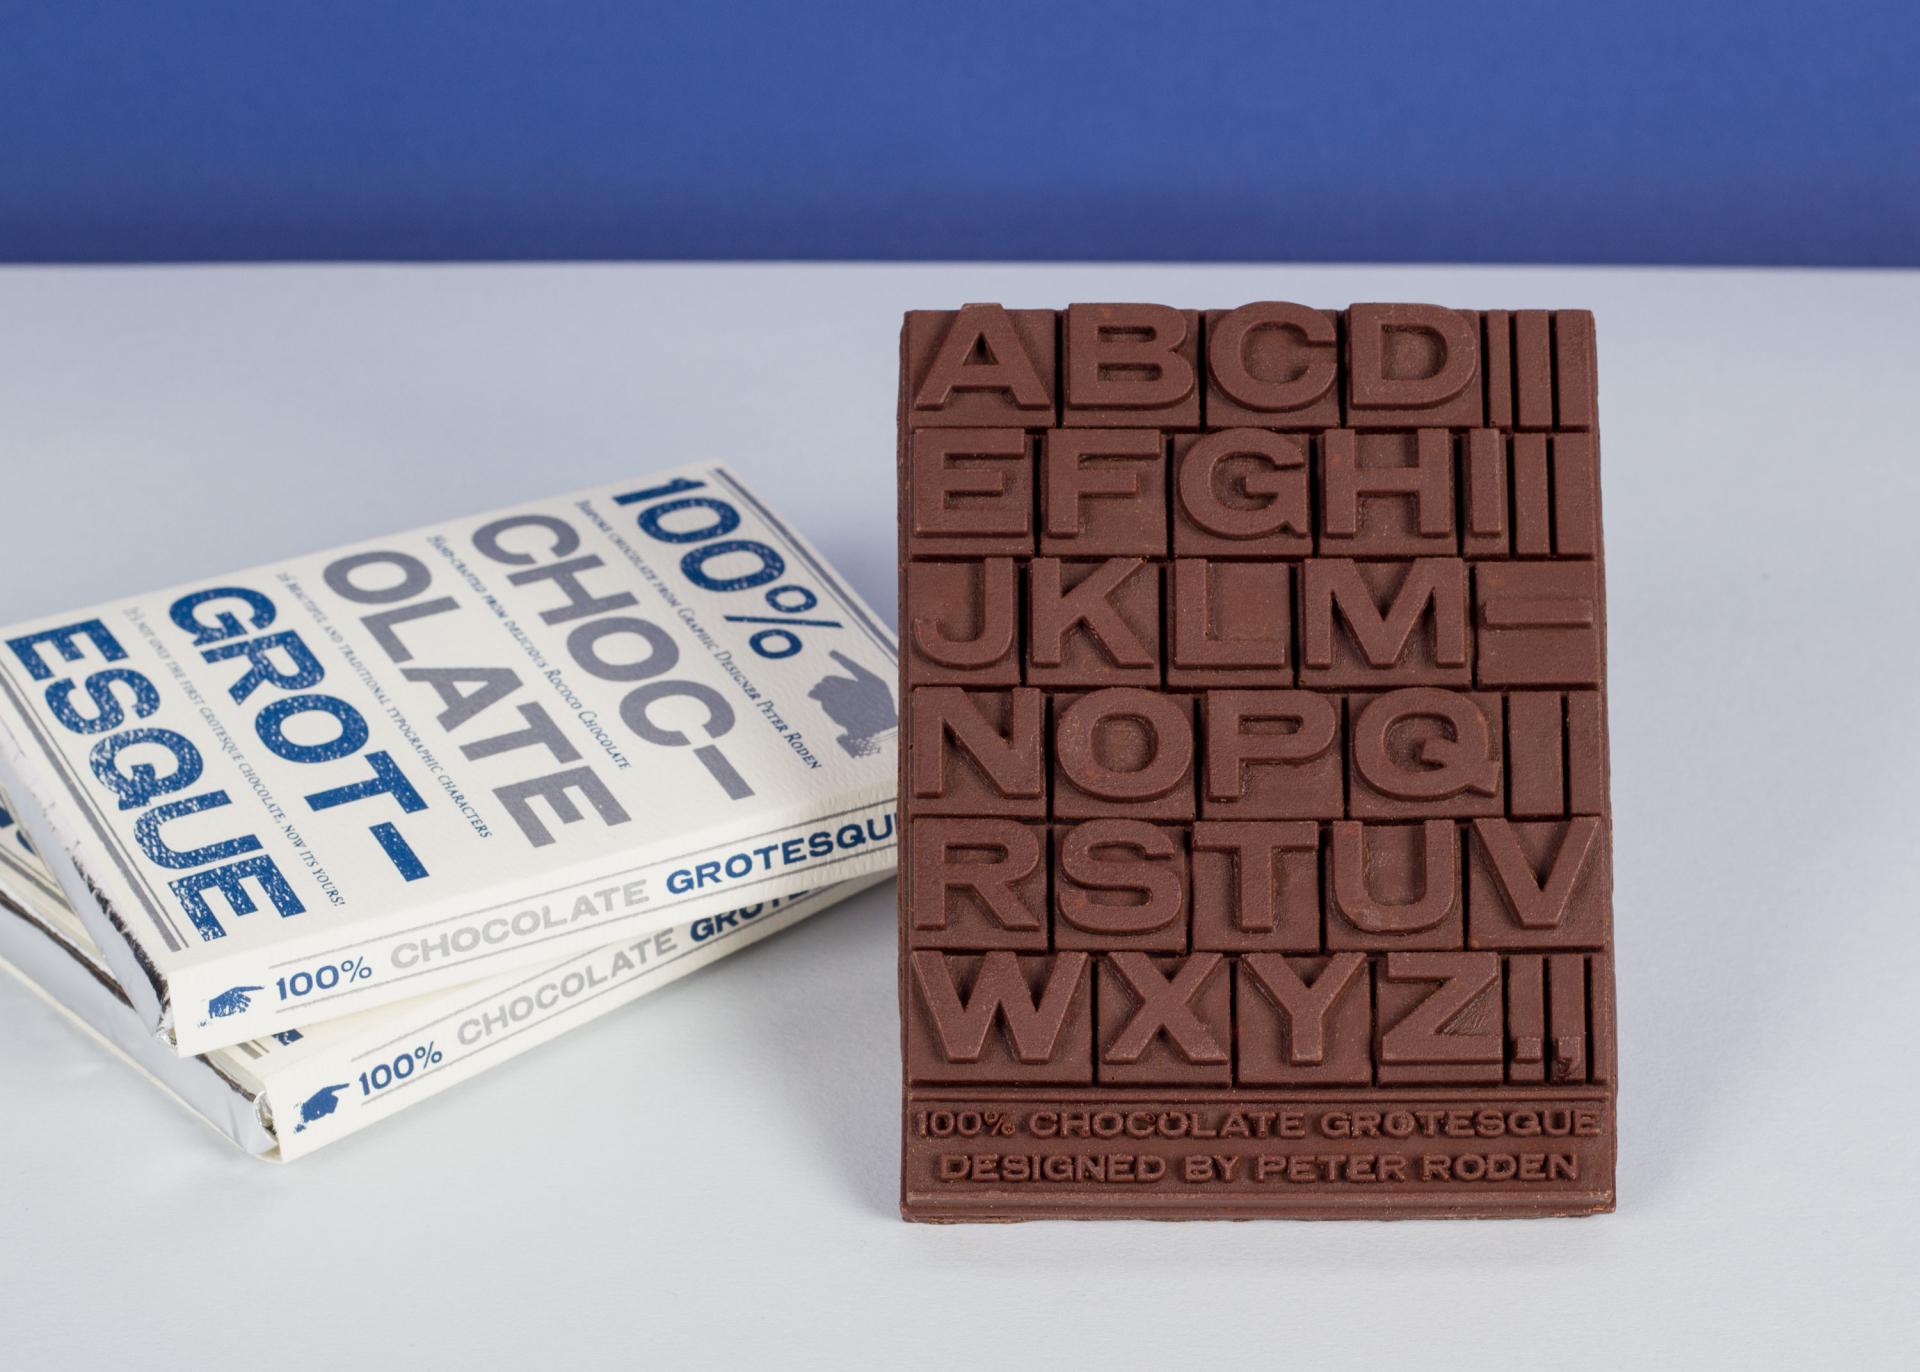 Peter Roden, Chocolate Grotesque, 2015